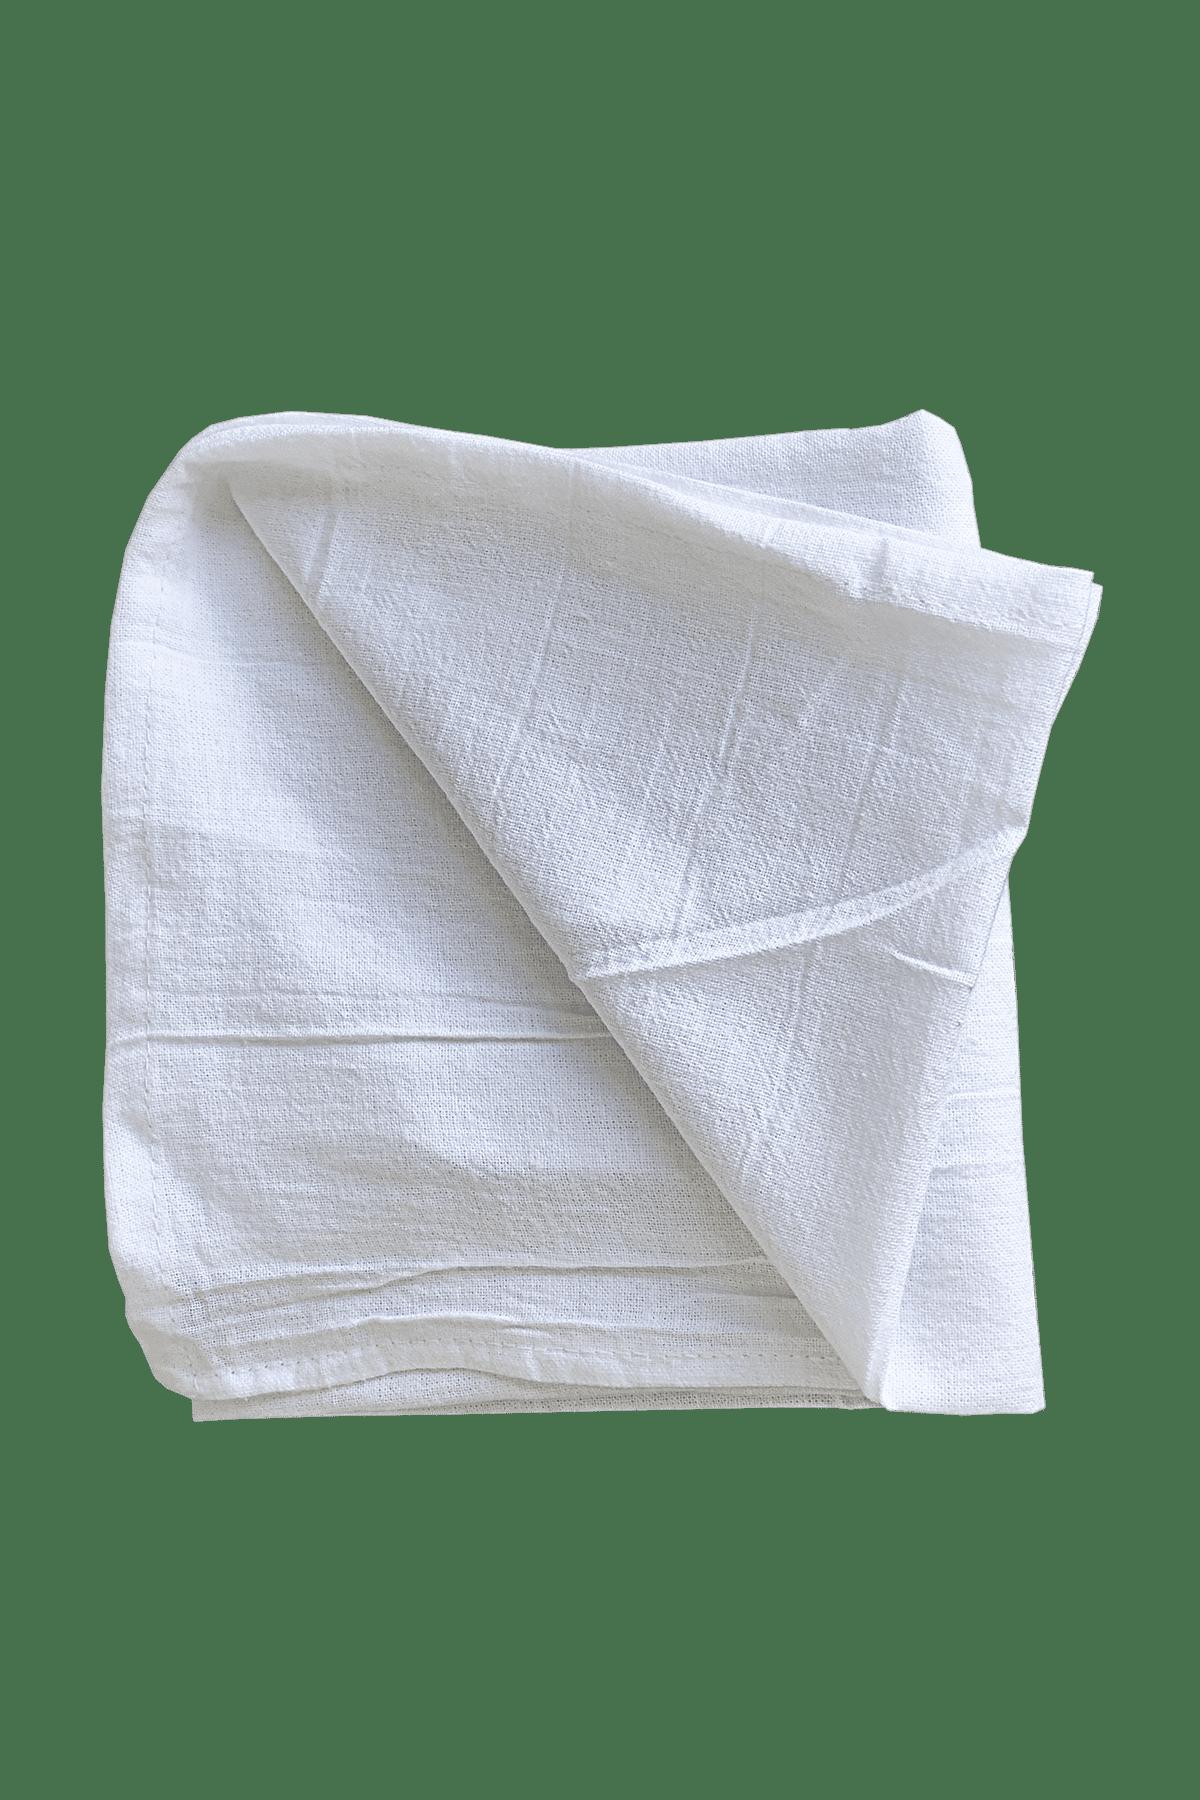 White & Organic Natural Flour Sack Towels, Sample Pack 28